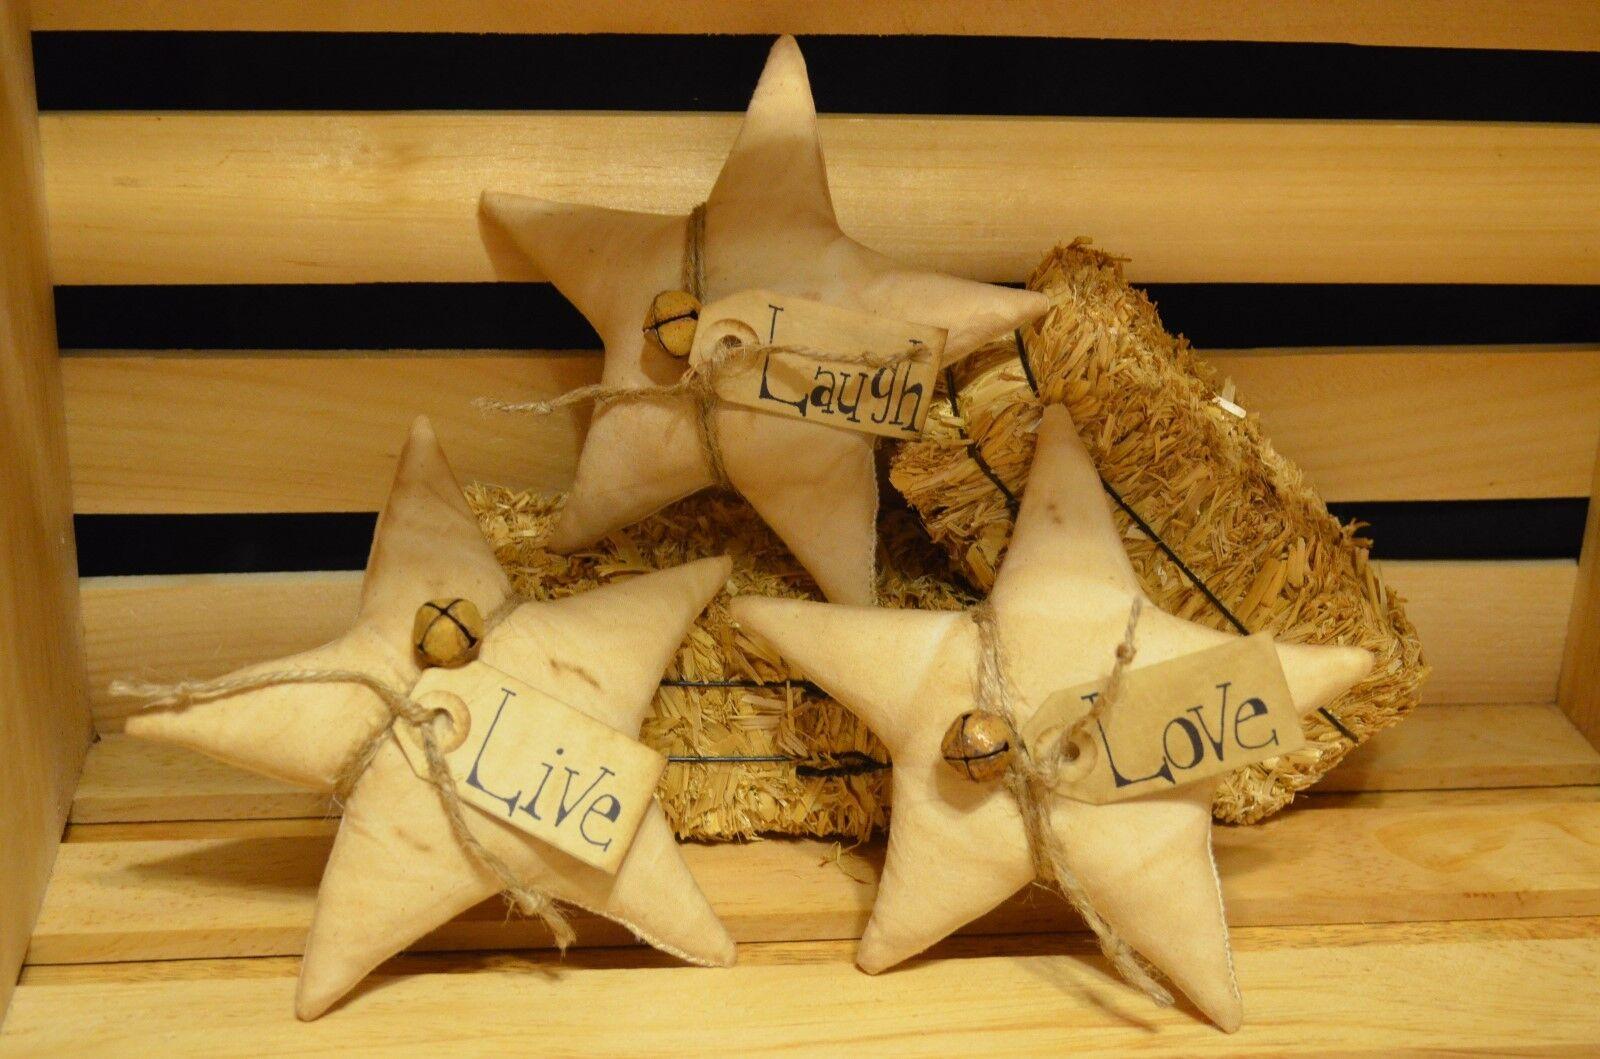 3 LIVE LAUGH LOVE Stuffed Ornies Primitive Folk Art Bowl Filler STAR DECOR Rusty